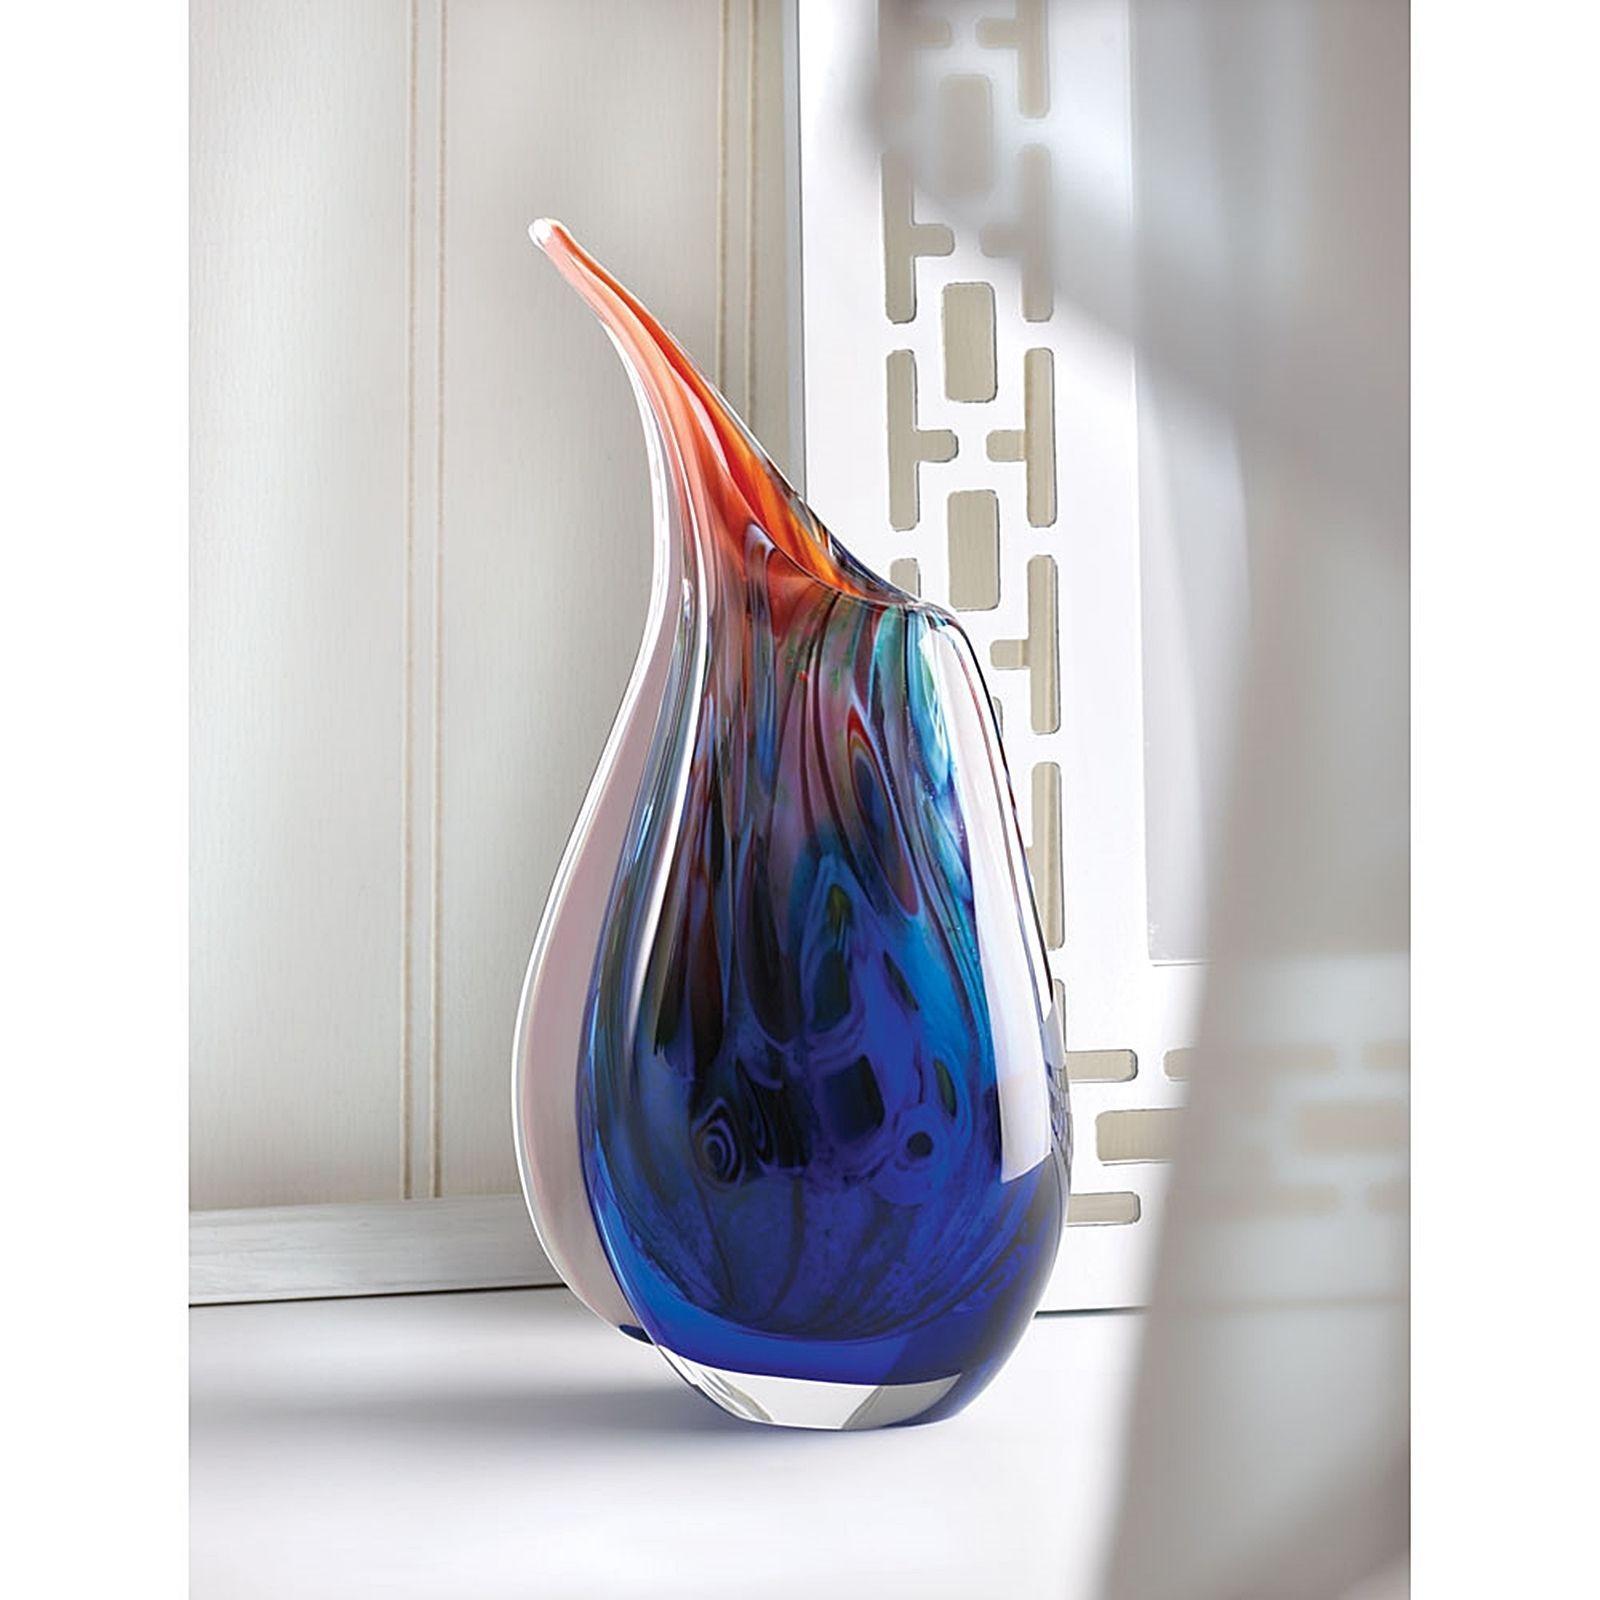 cobalt blue vases bulk of the dream artistic glass vase features a splendor of colors captured for the dream artistic glass vase features a splendor of colors captured in glass with its